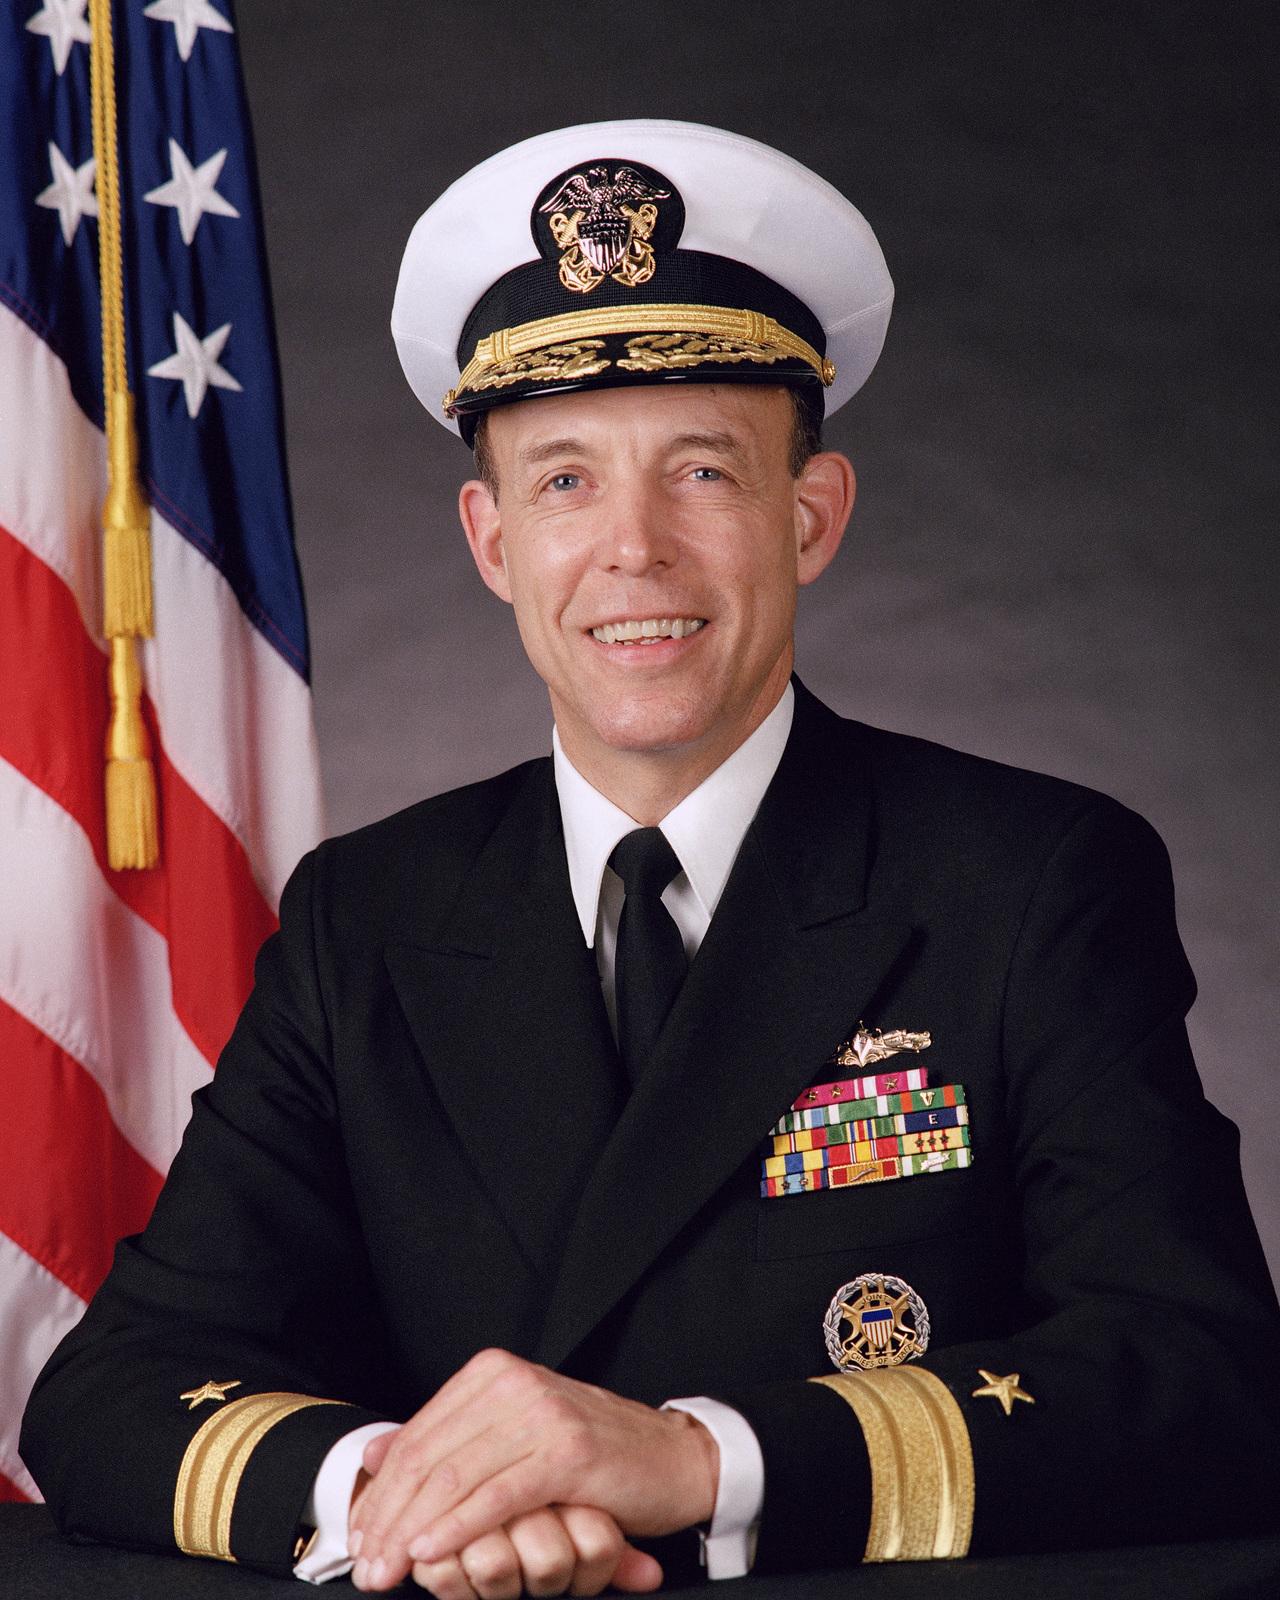 Robert Lucier Rear Adm. (lower half) Stephen S. Clarey, USN (covered) OFFICIAL U.S. NAVY PHOTO (RELEASED)